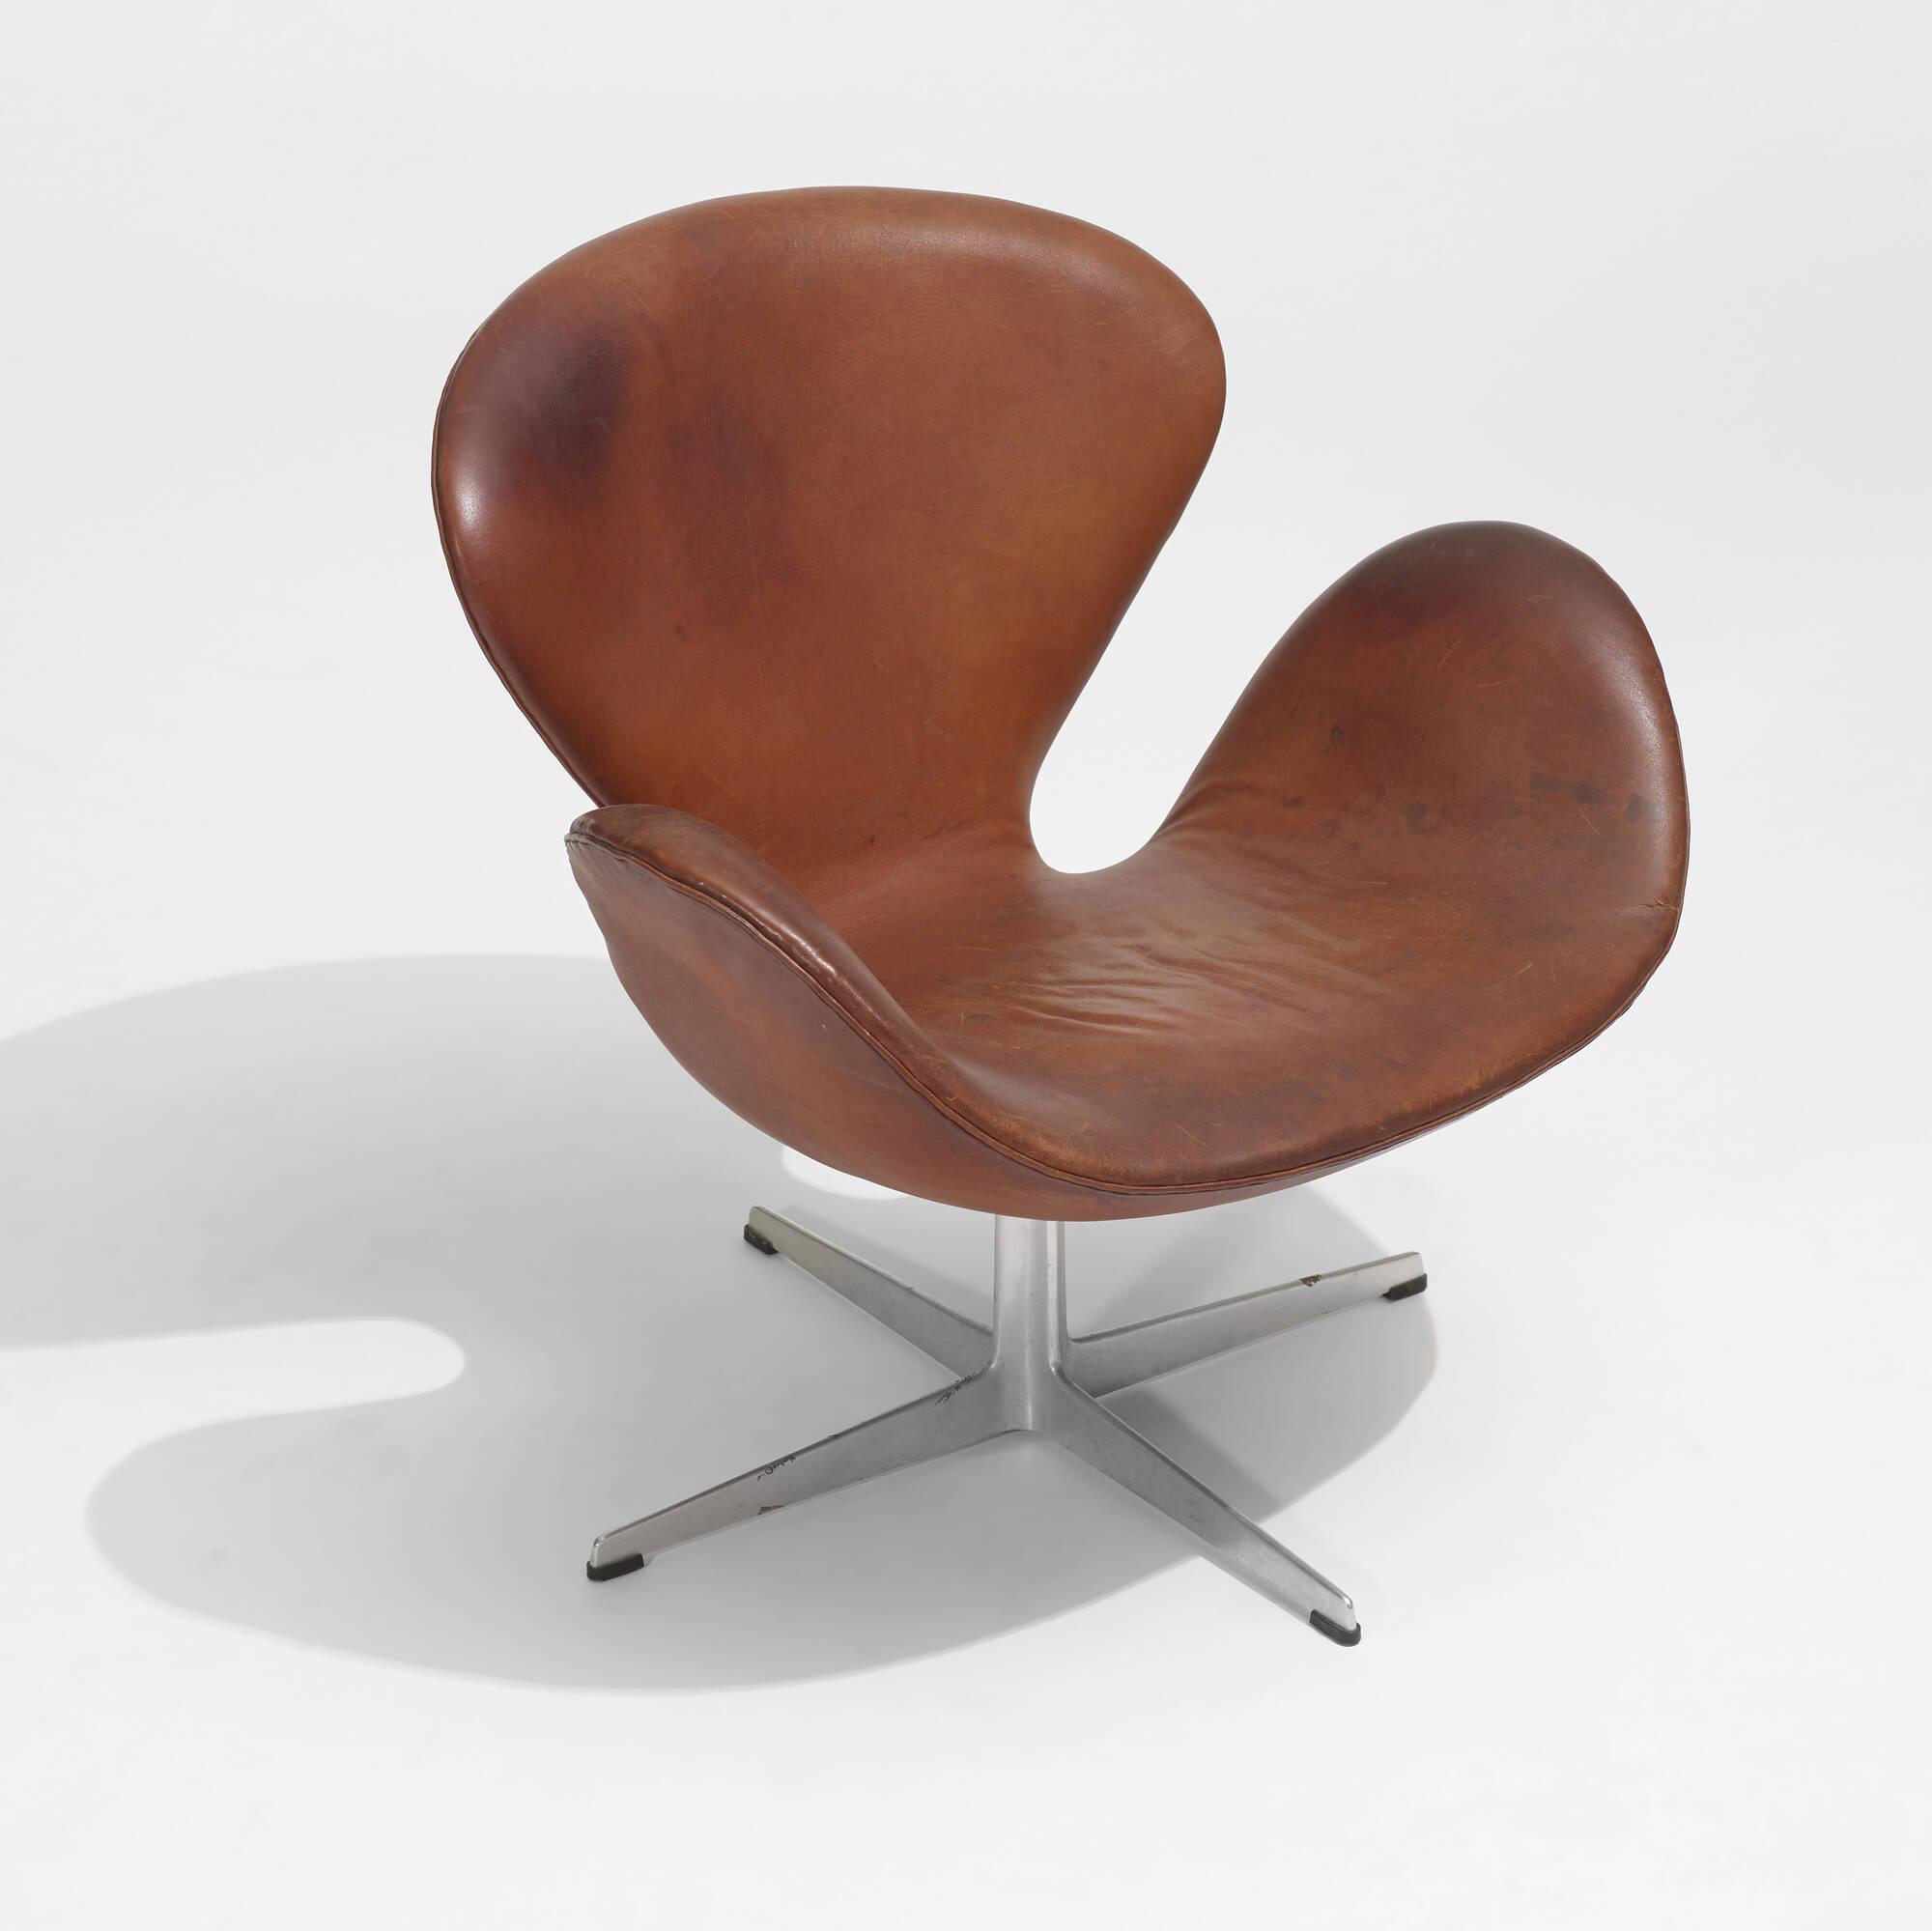 103: Arne Jacobsen / Swan chair (3 of 3)